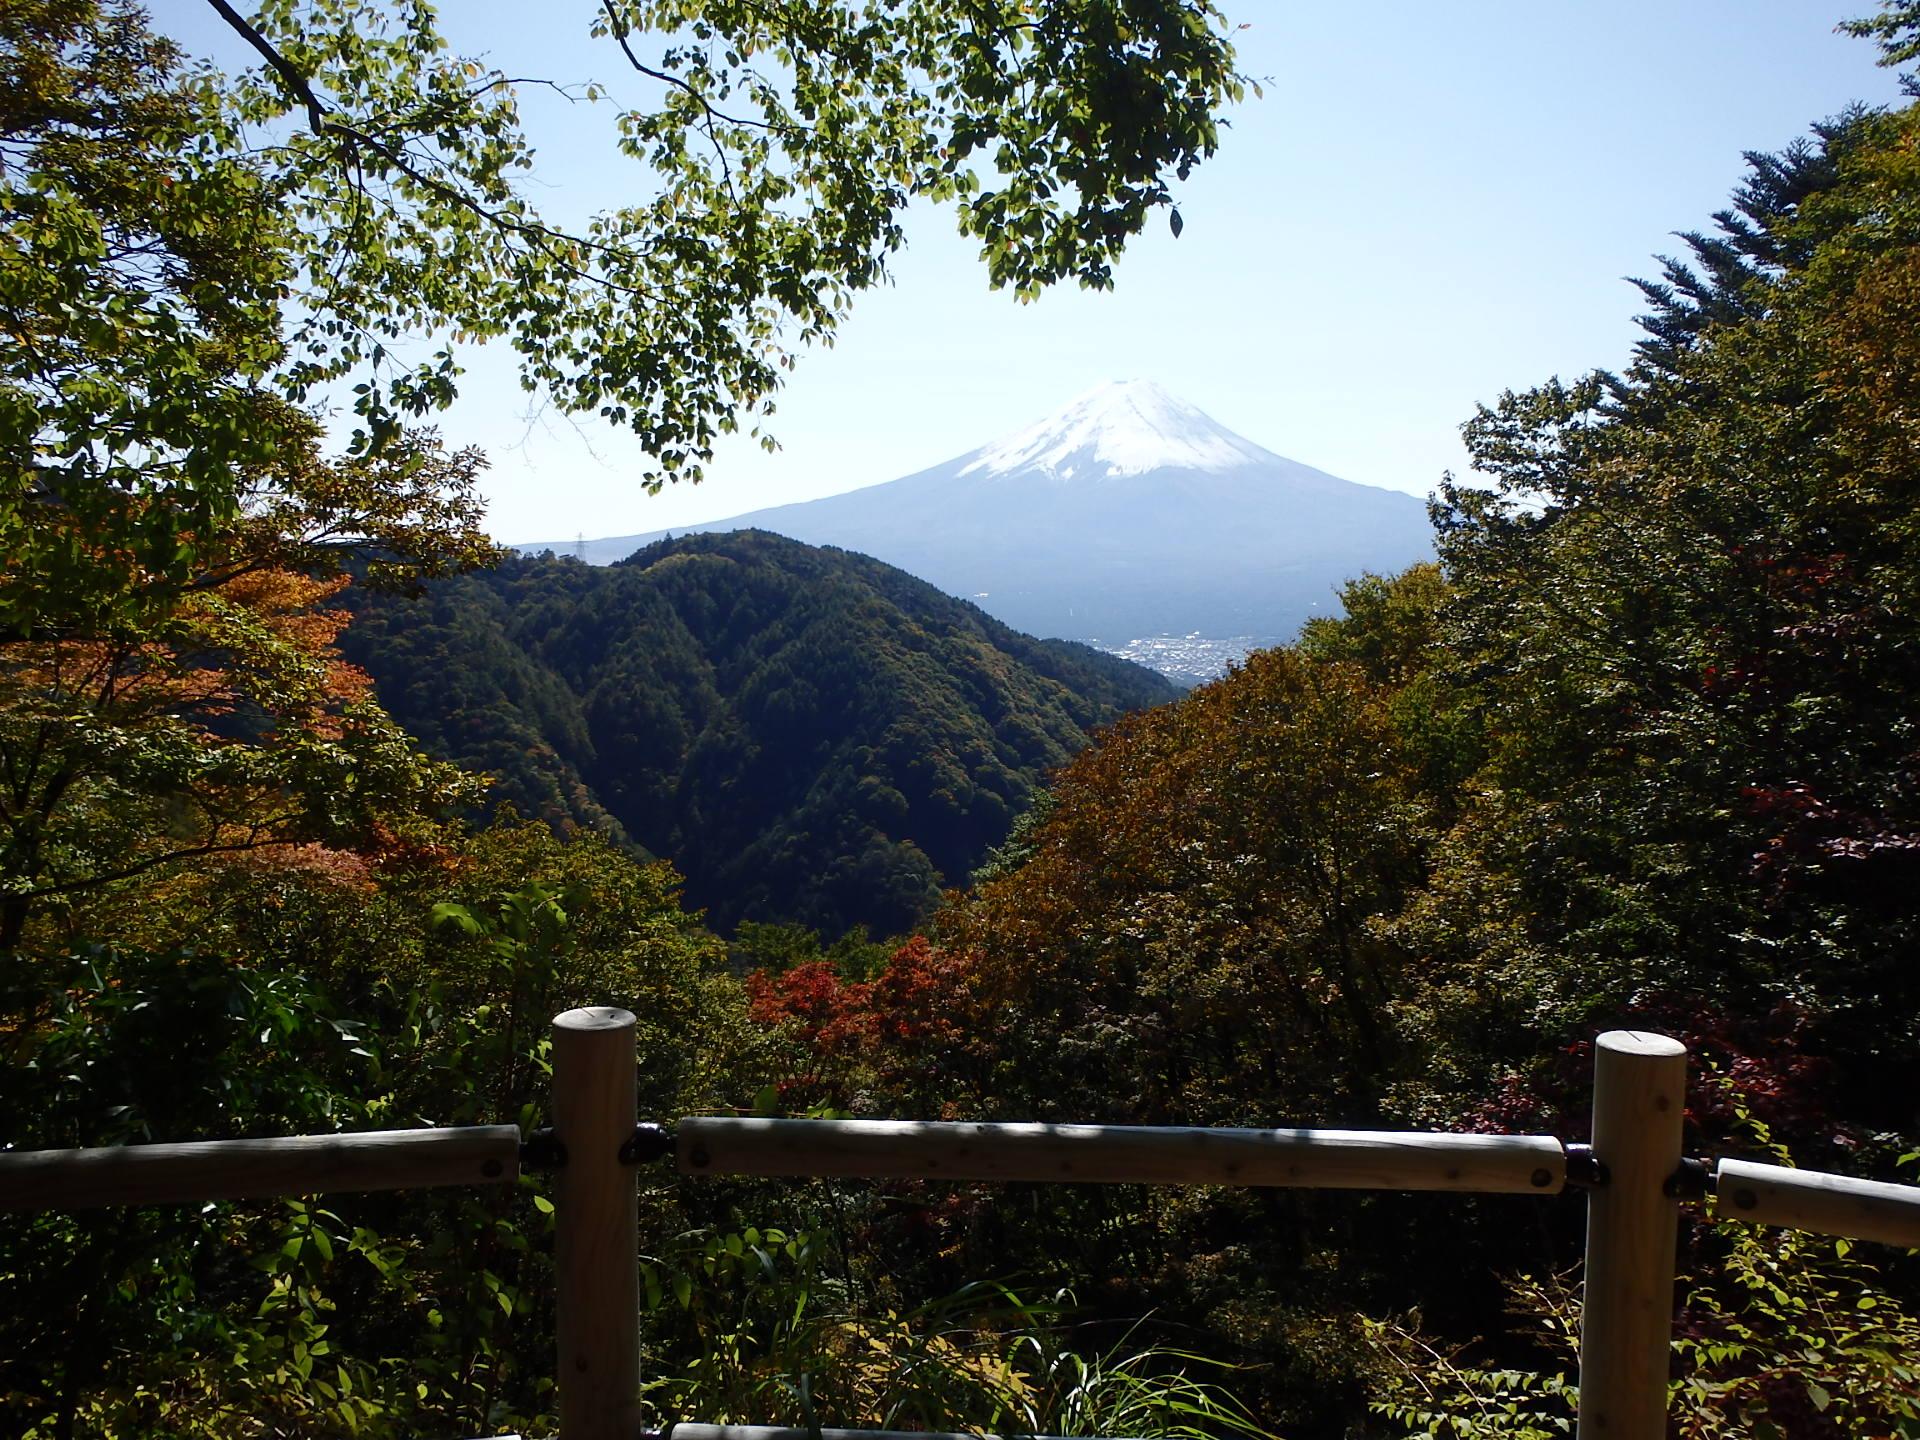 http://www.yamanashi-kankou.jp/blog/p5Y3rV_31.jpg